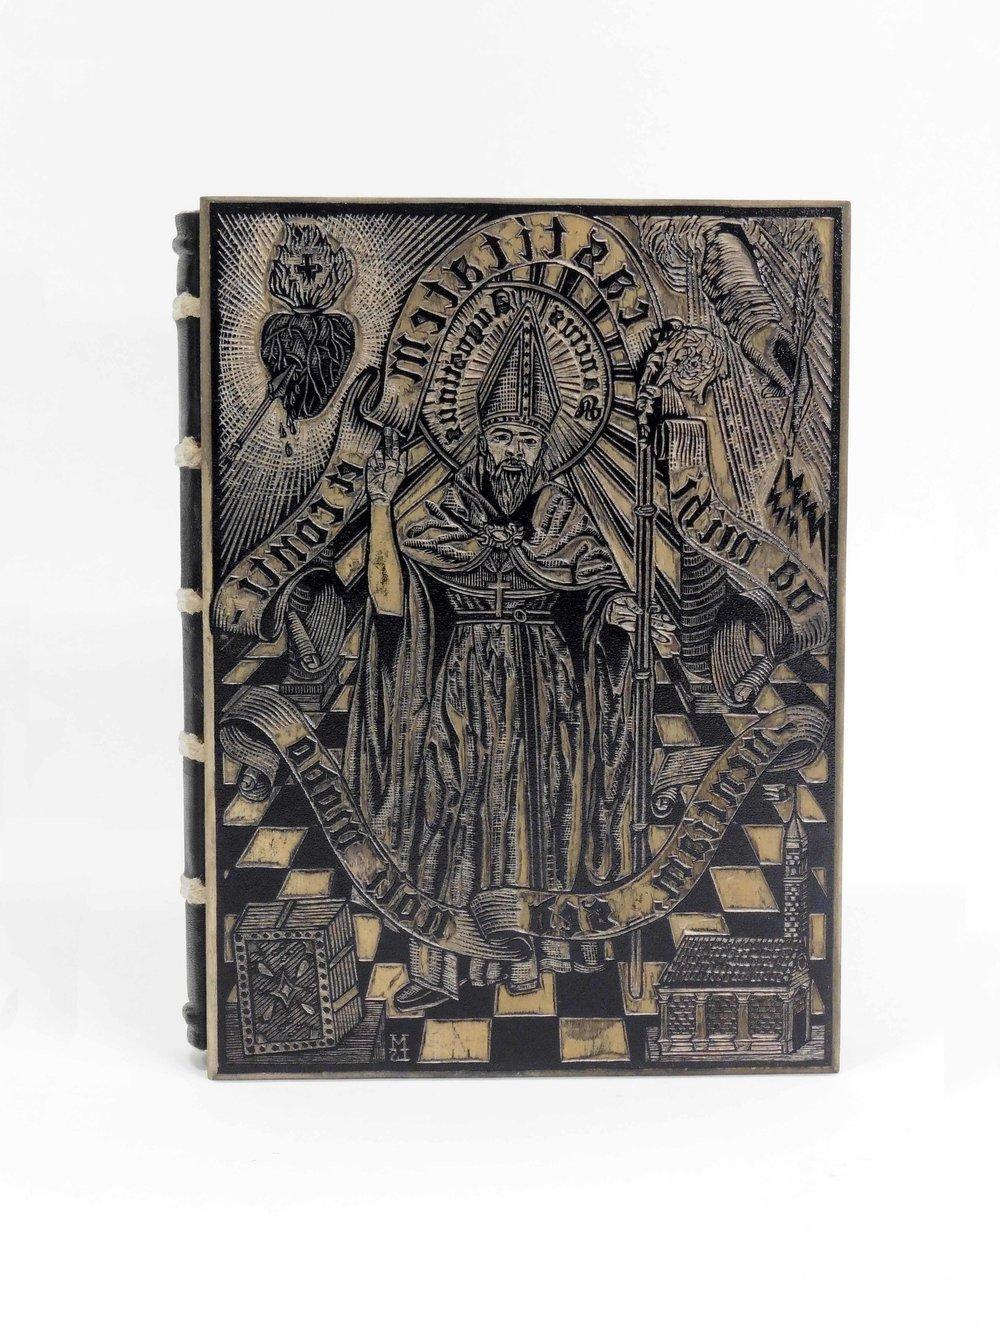 Saint Augustine of Hippo B Theologian Patron Saint Bishop Stationery Note Cards Image Taken From My OOAK Original Acrylic Catholic Art